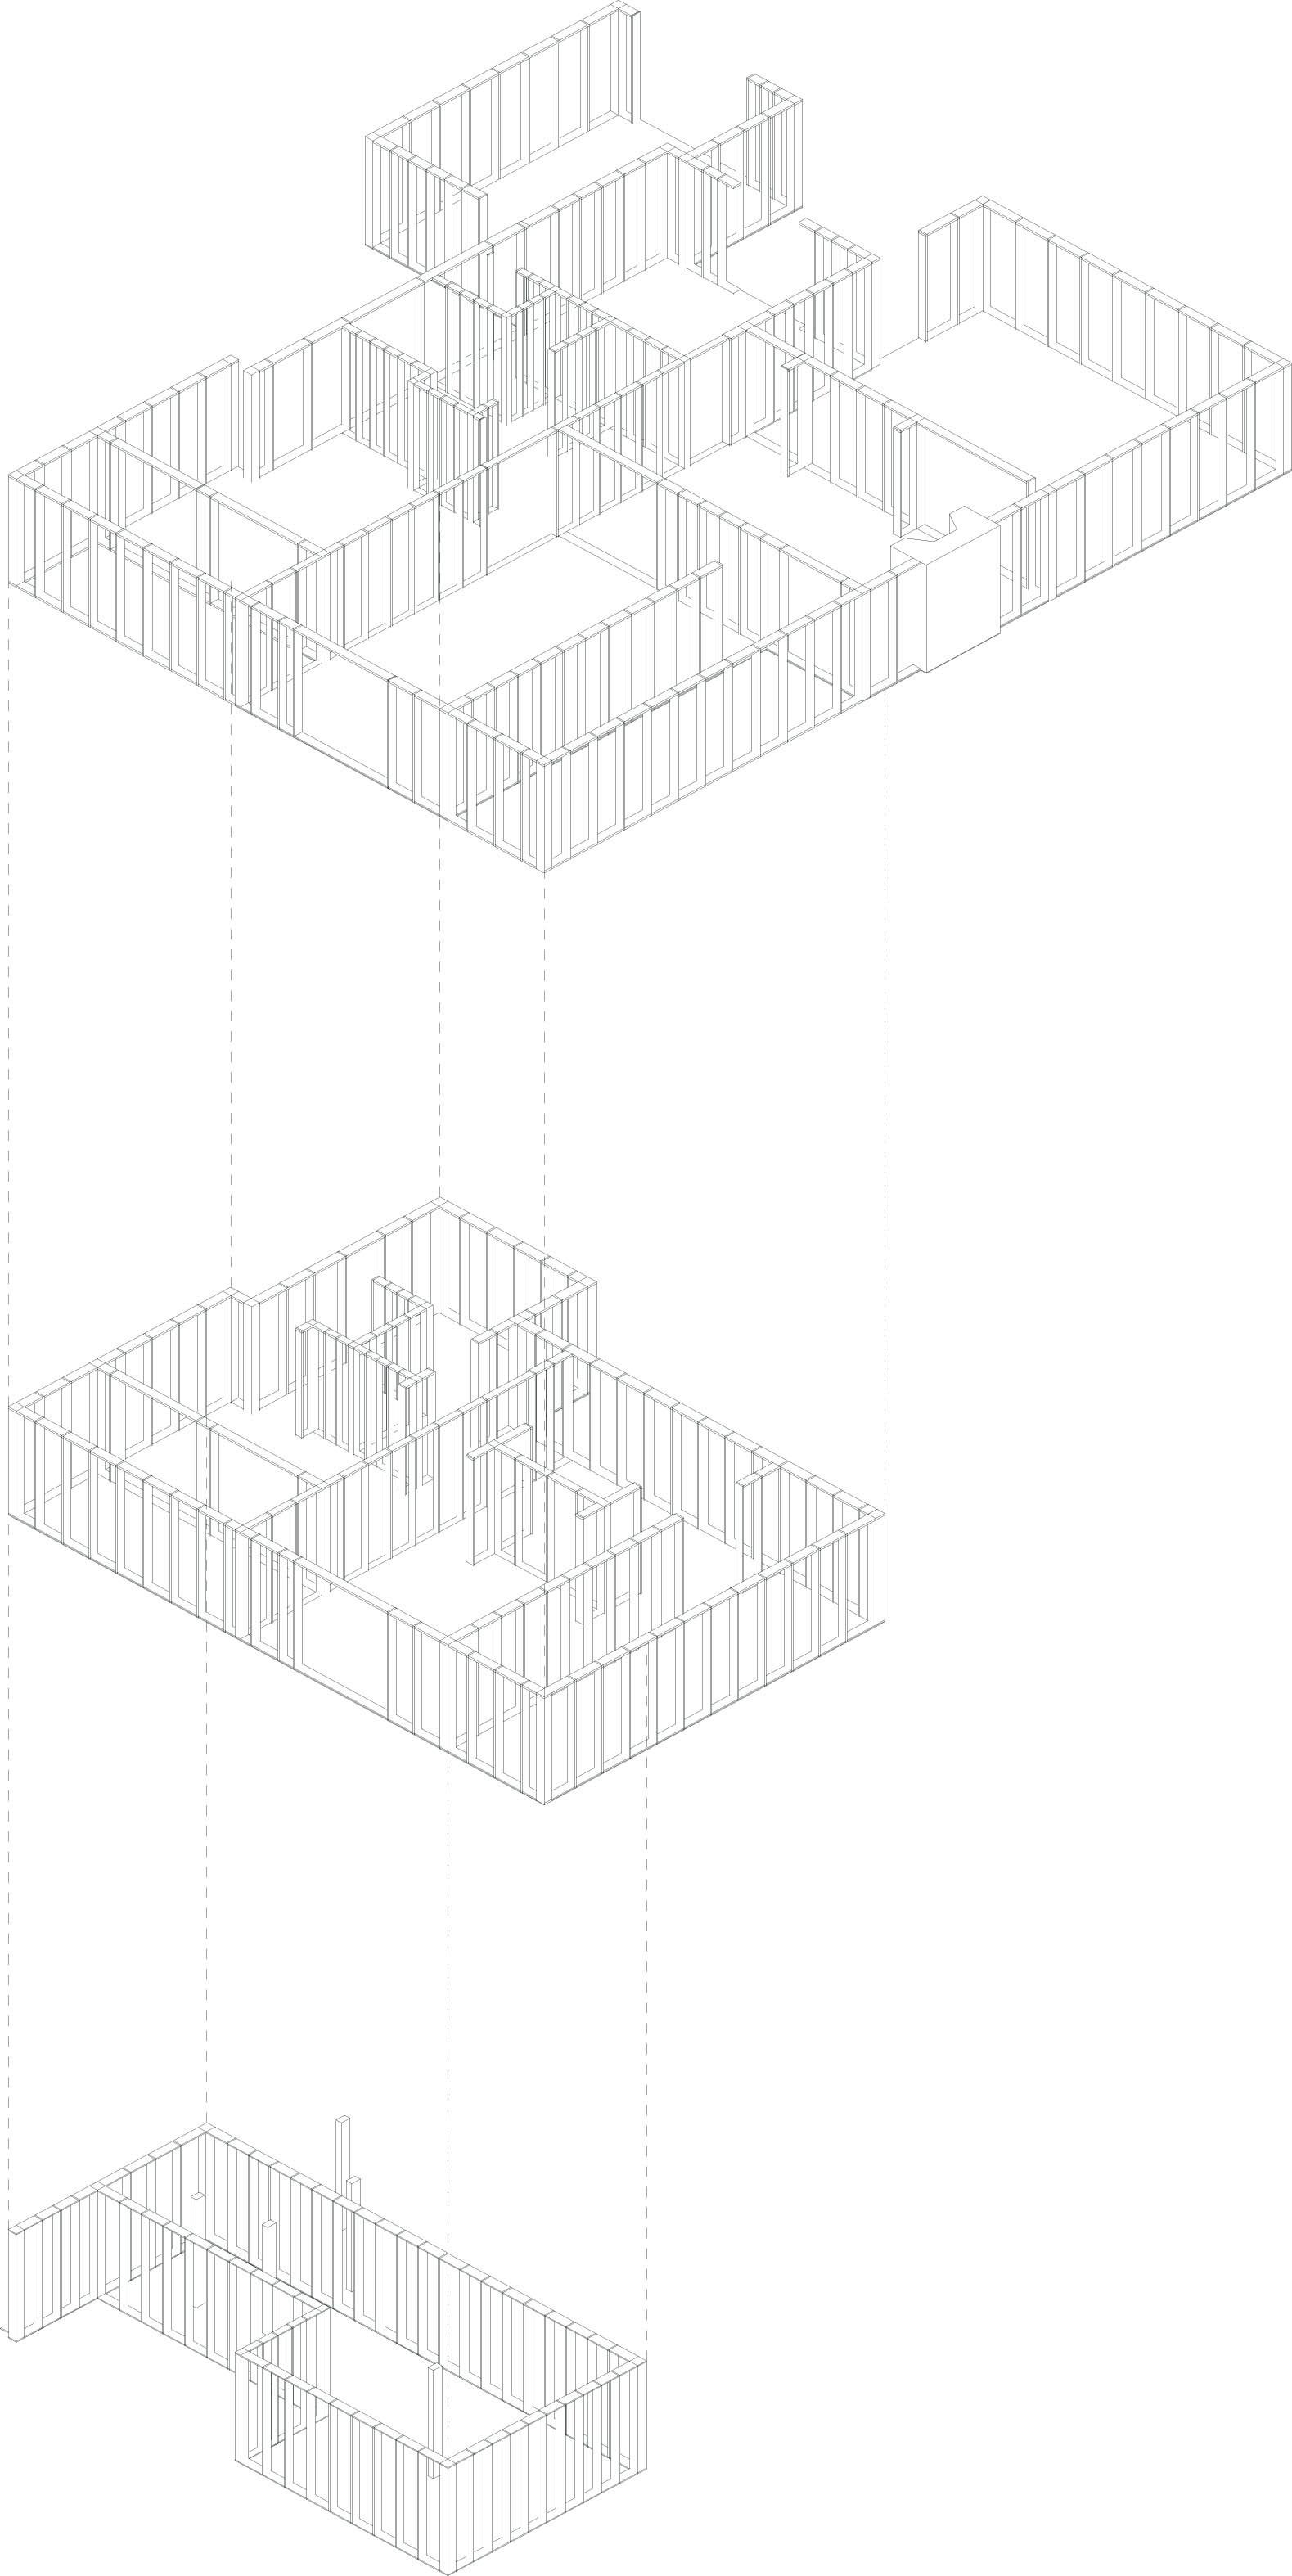 Fritz haeg bernardi residence estructura arquitectura for Estructura arquitectura